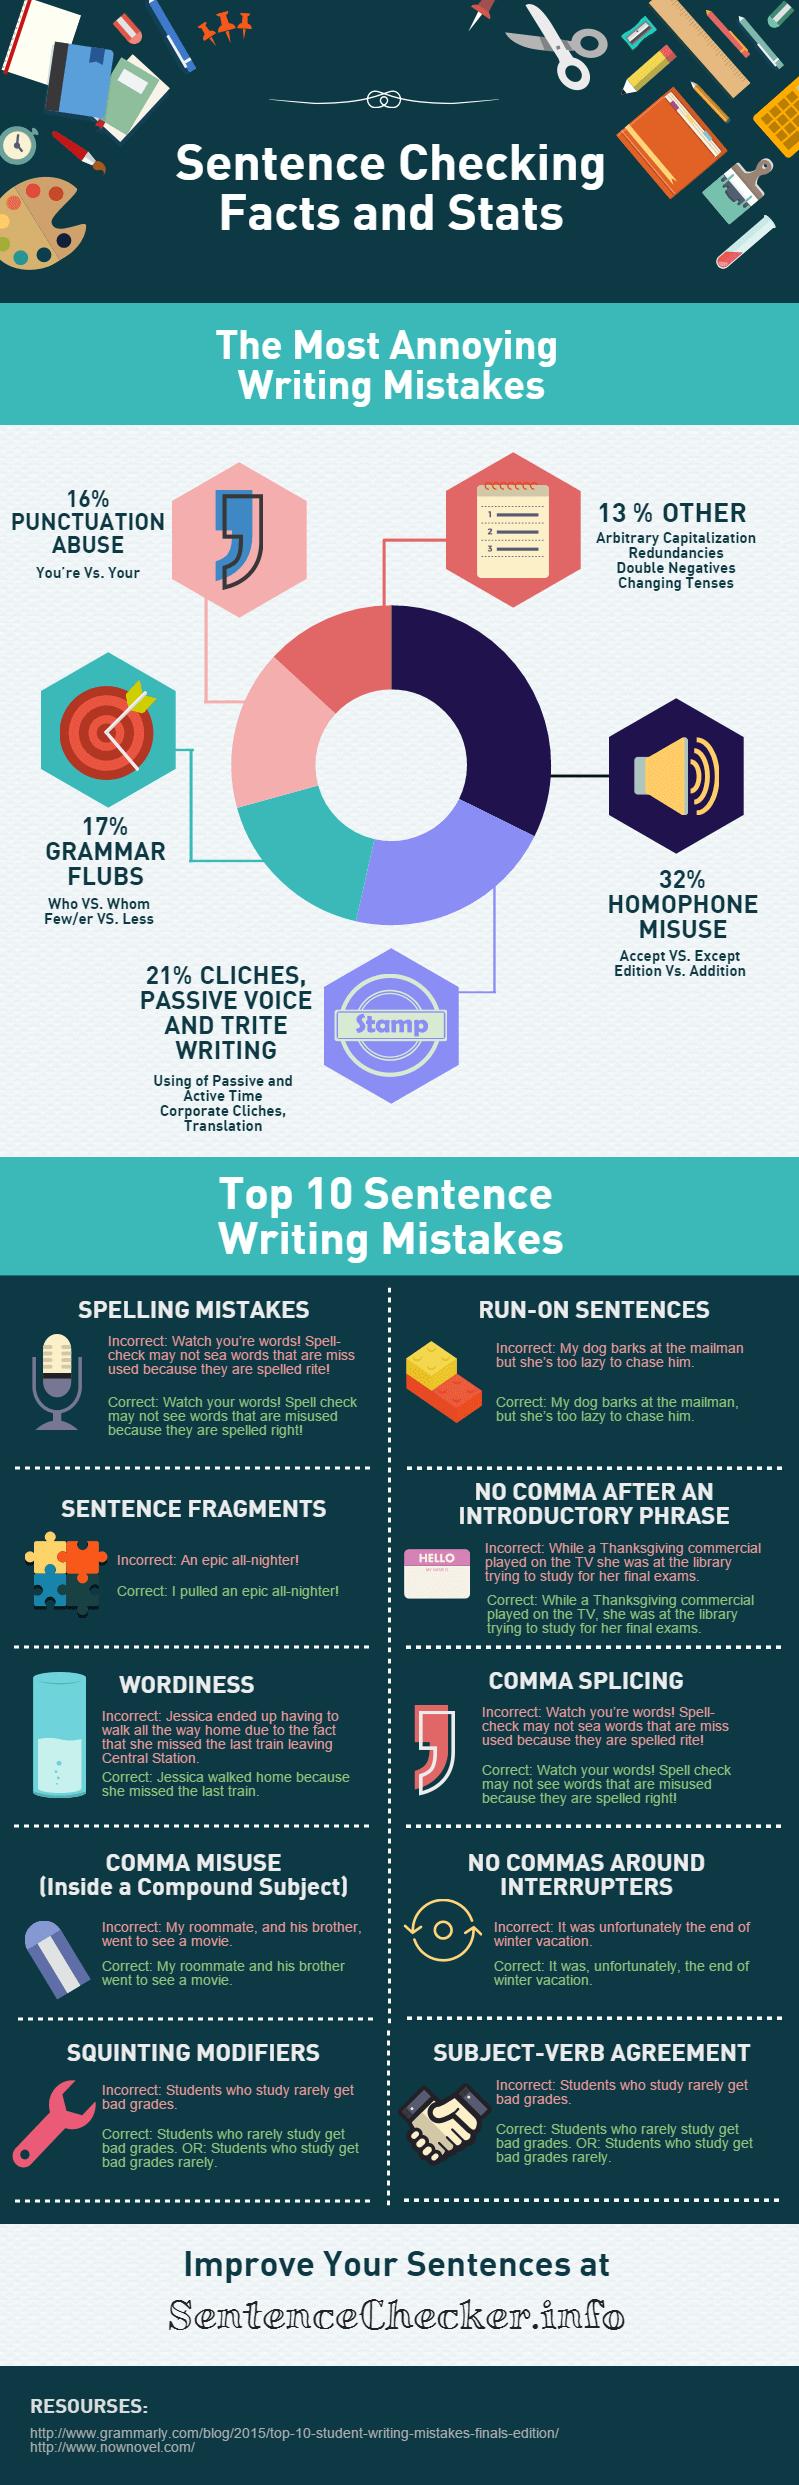 Sentence-checking